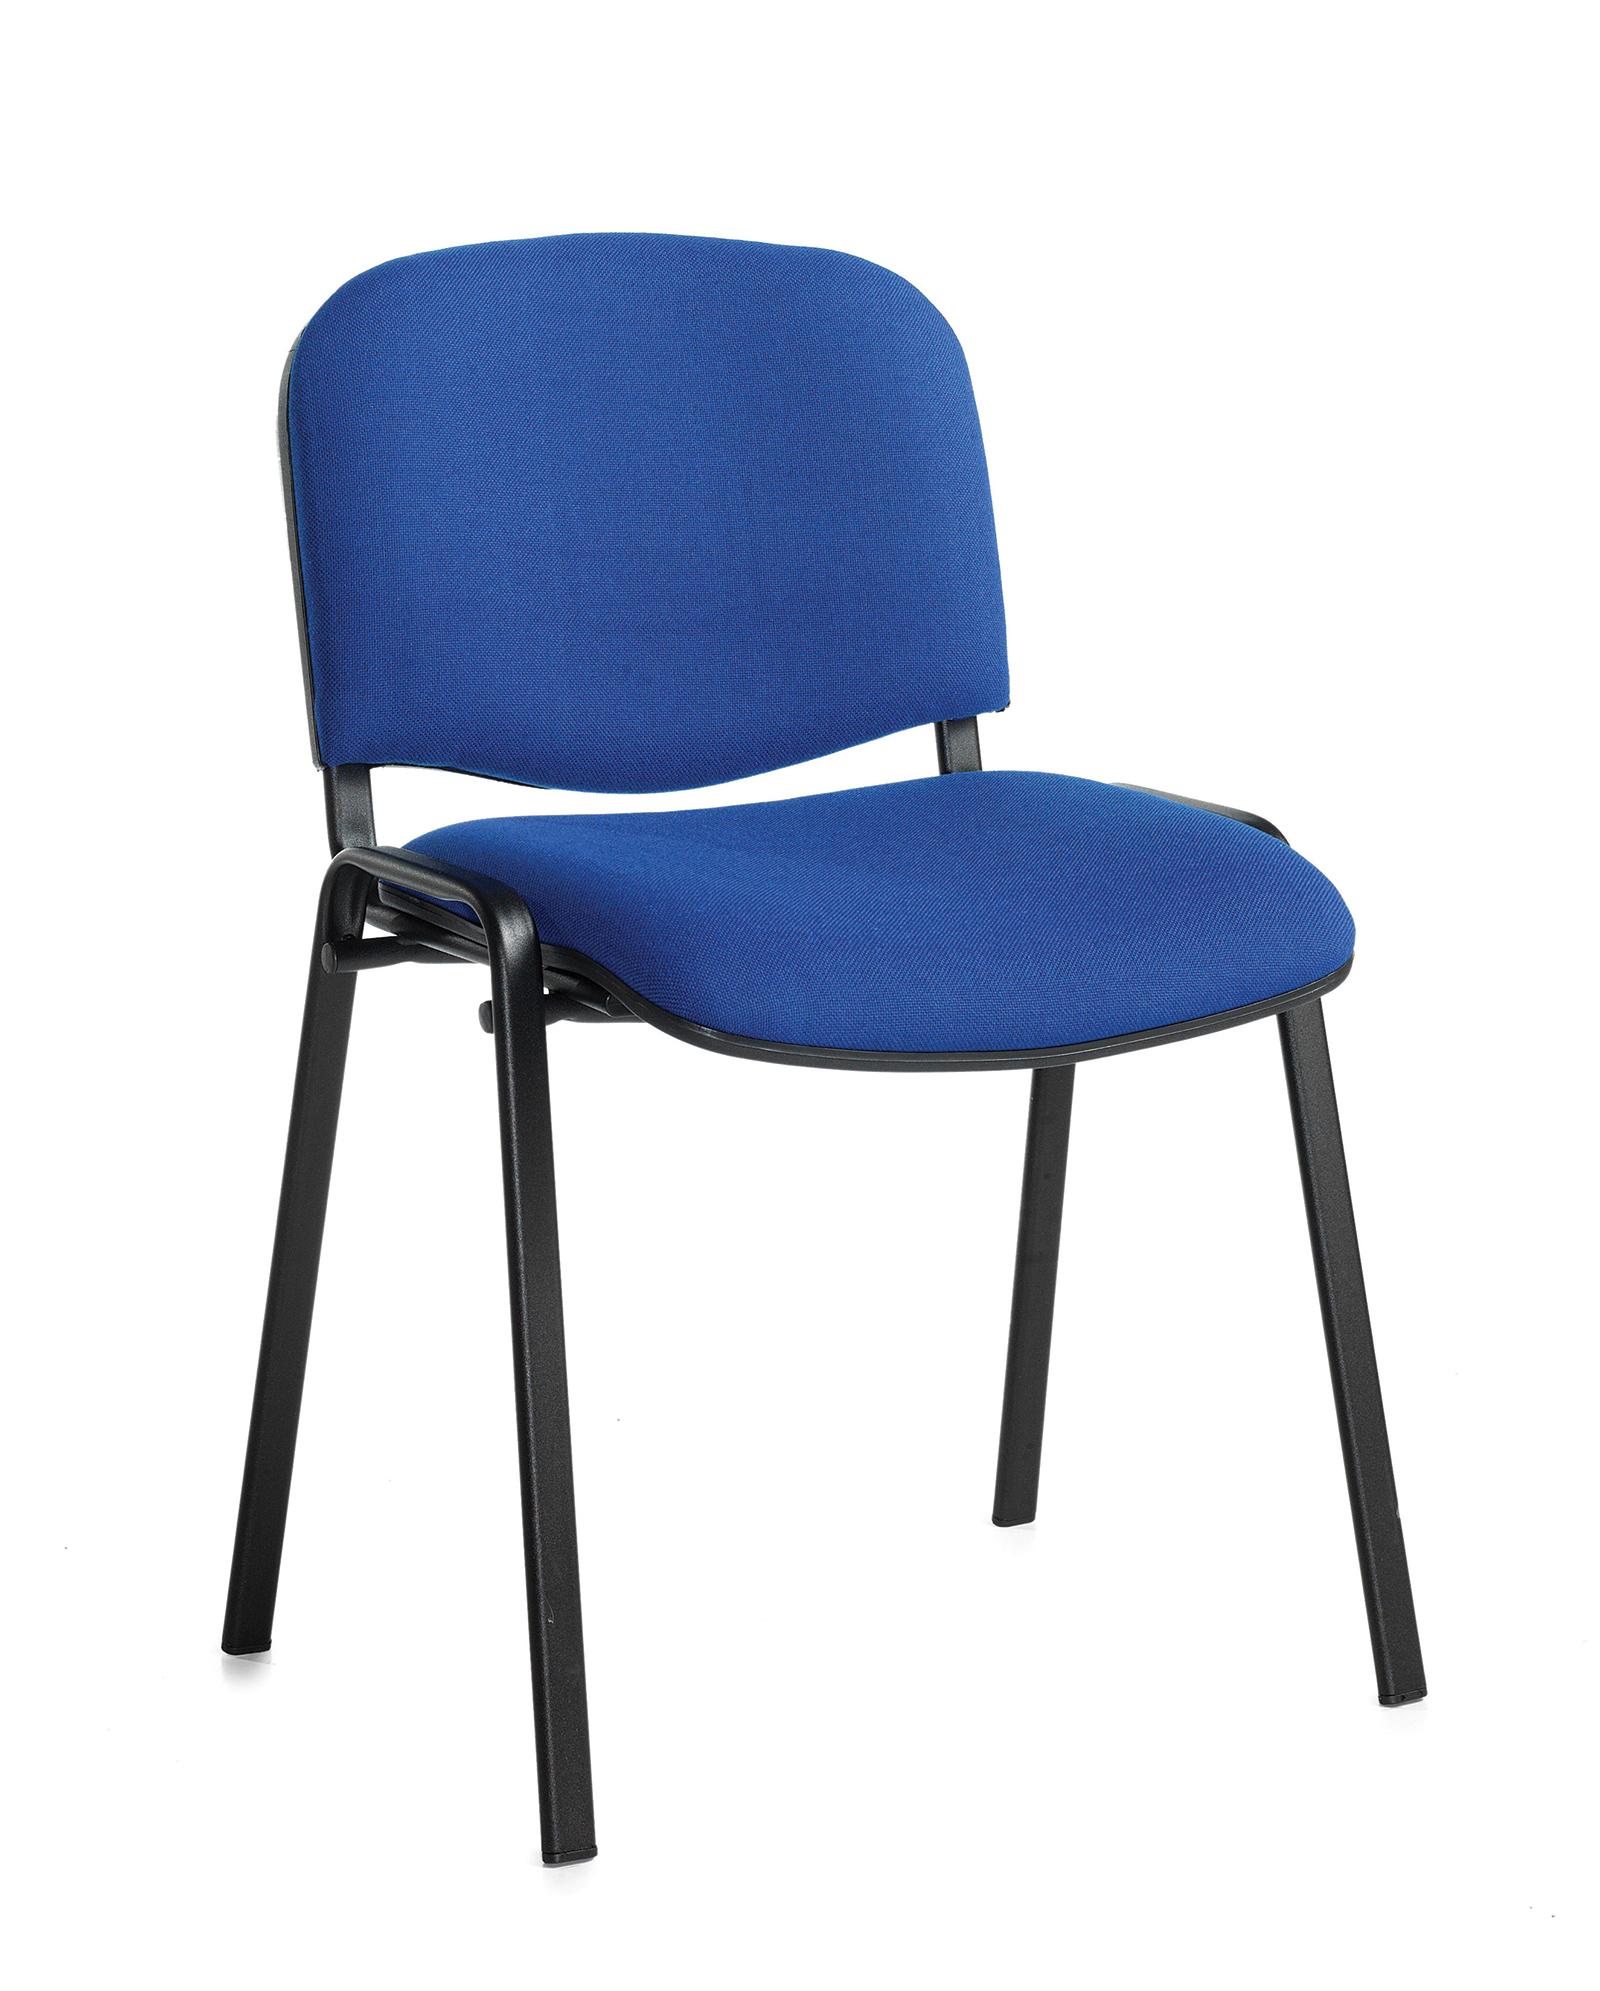 Taurus meeting room chair black frame